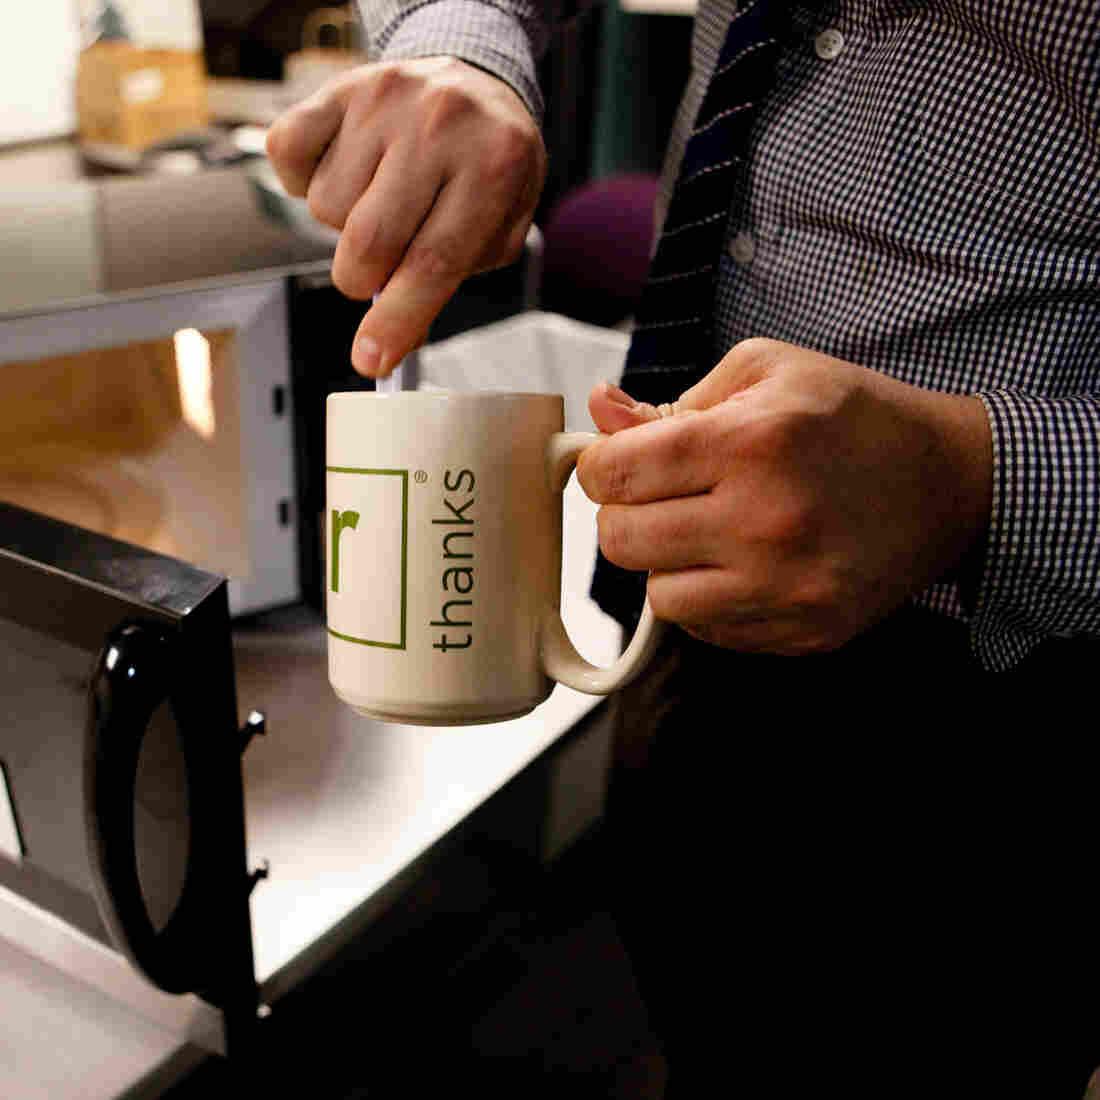 Washington Post Food and Travel Editor Joe Yonan whips up some macaroni and cheese in an NPR mug.